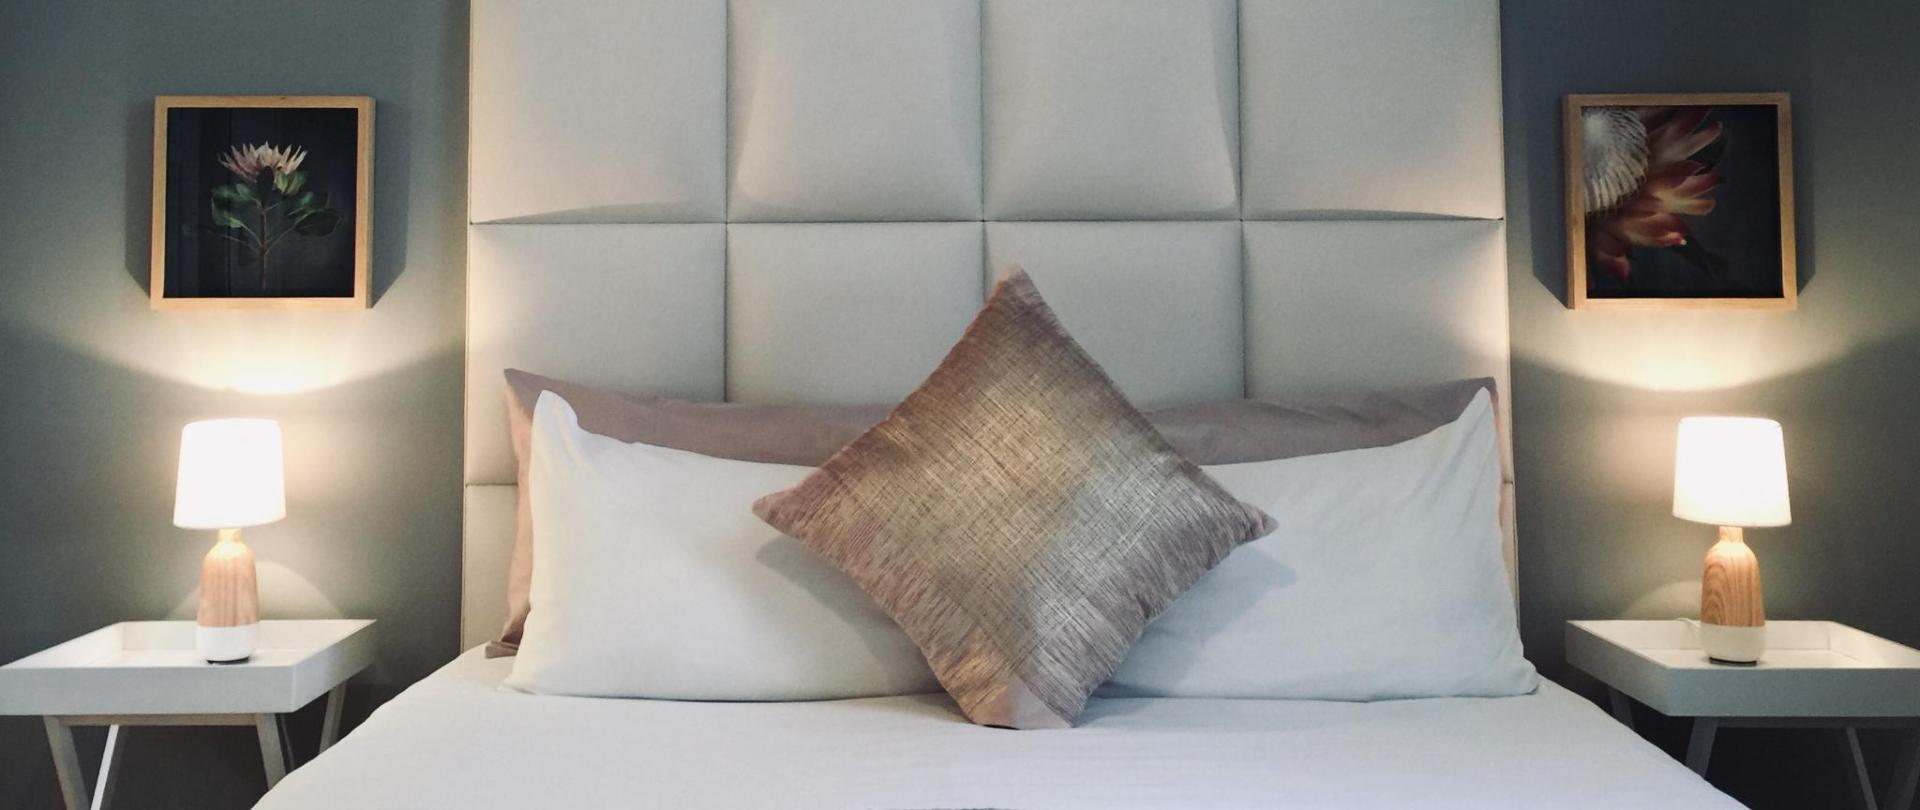 #2 bed.jpg